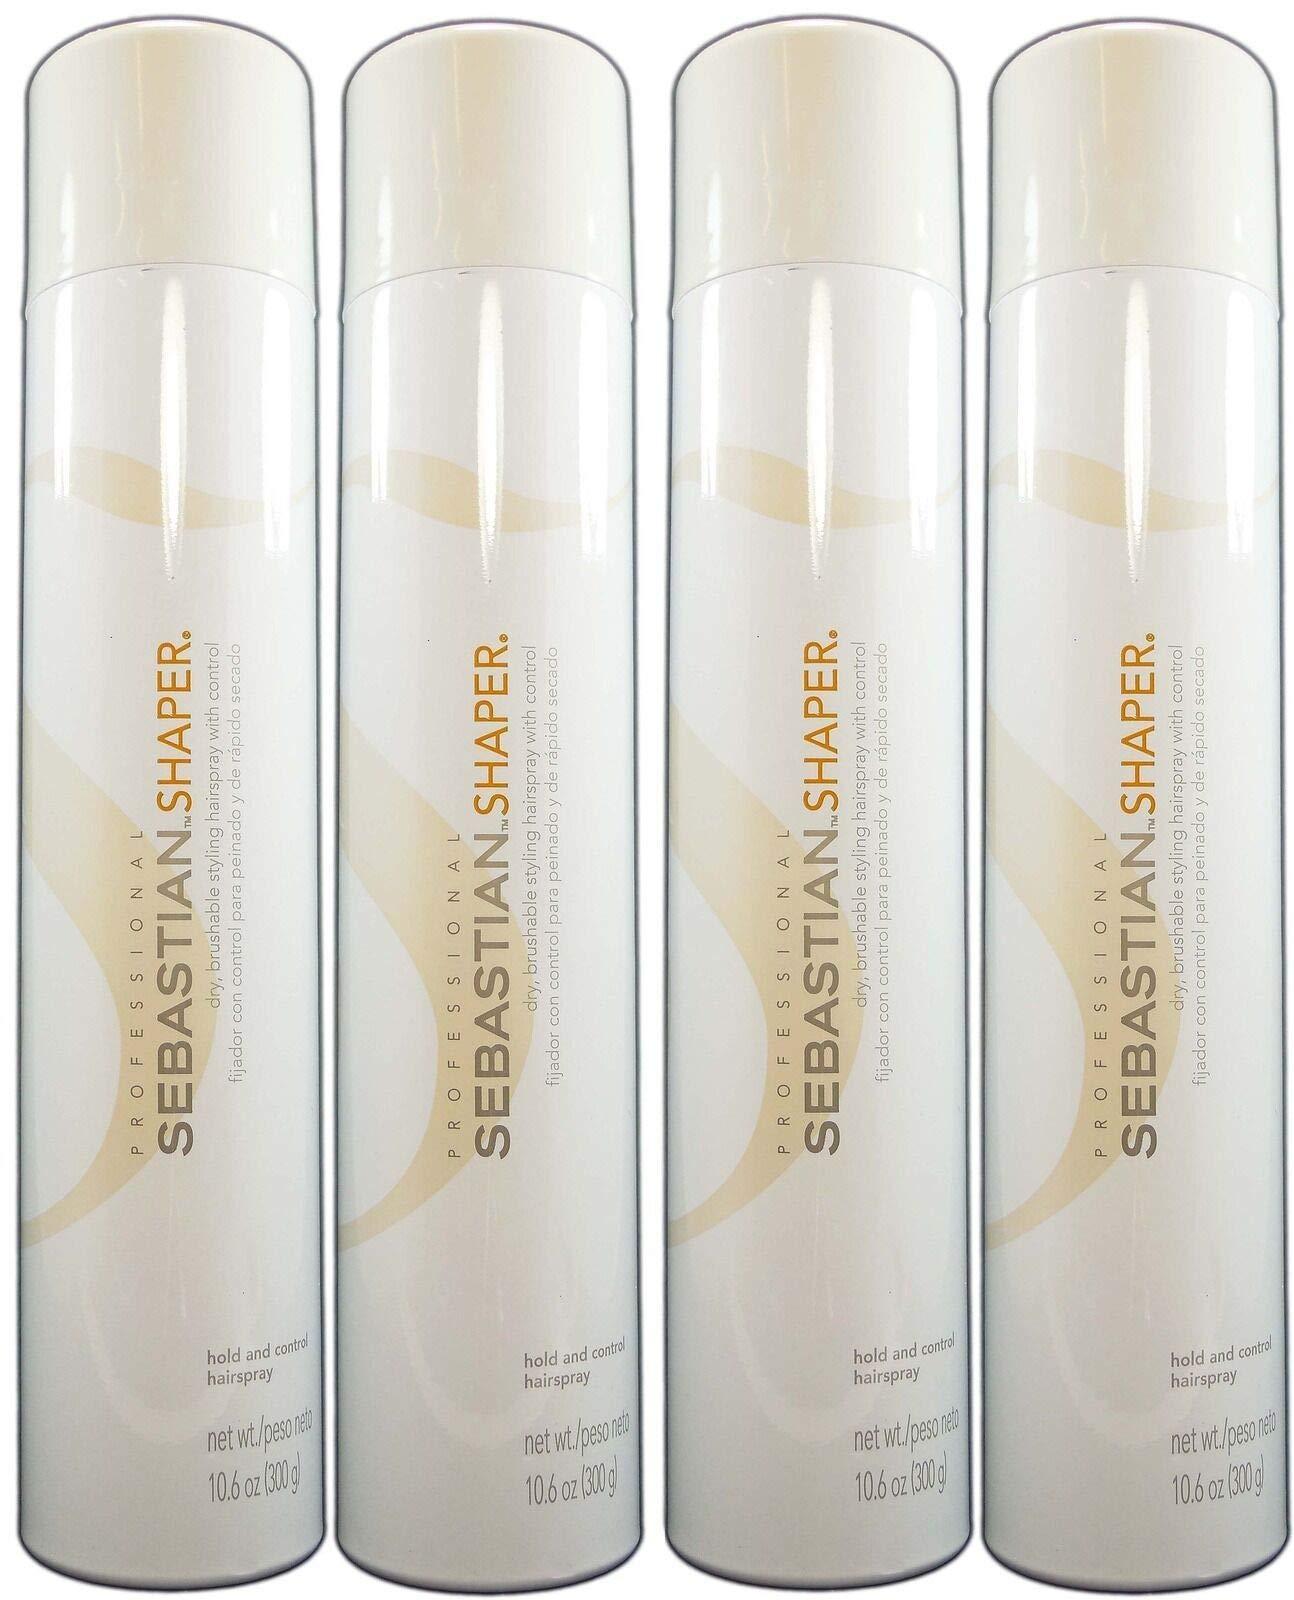 4 Pack Professional Shaper Hairspray 10.6 oz Each